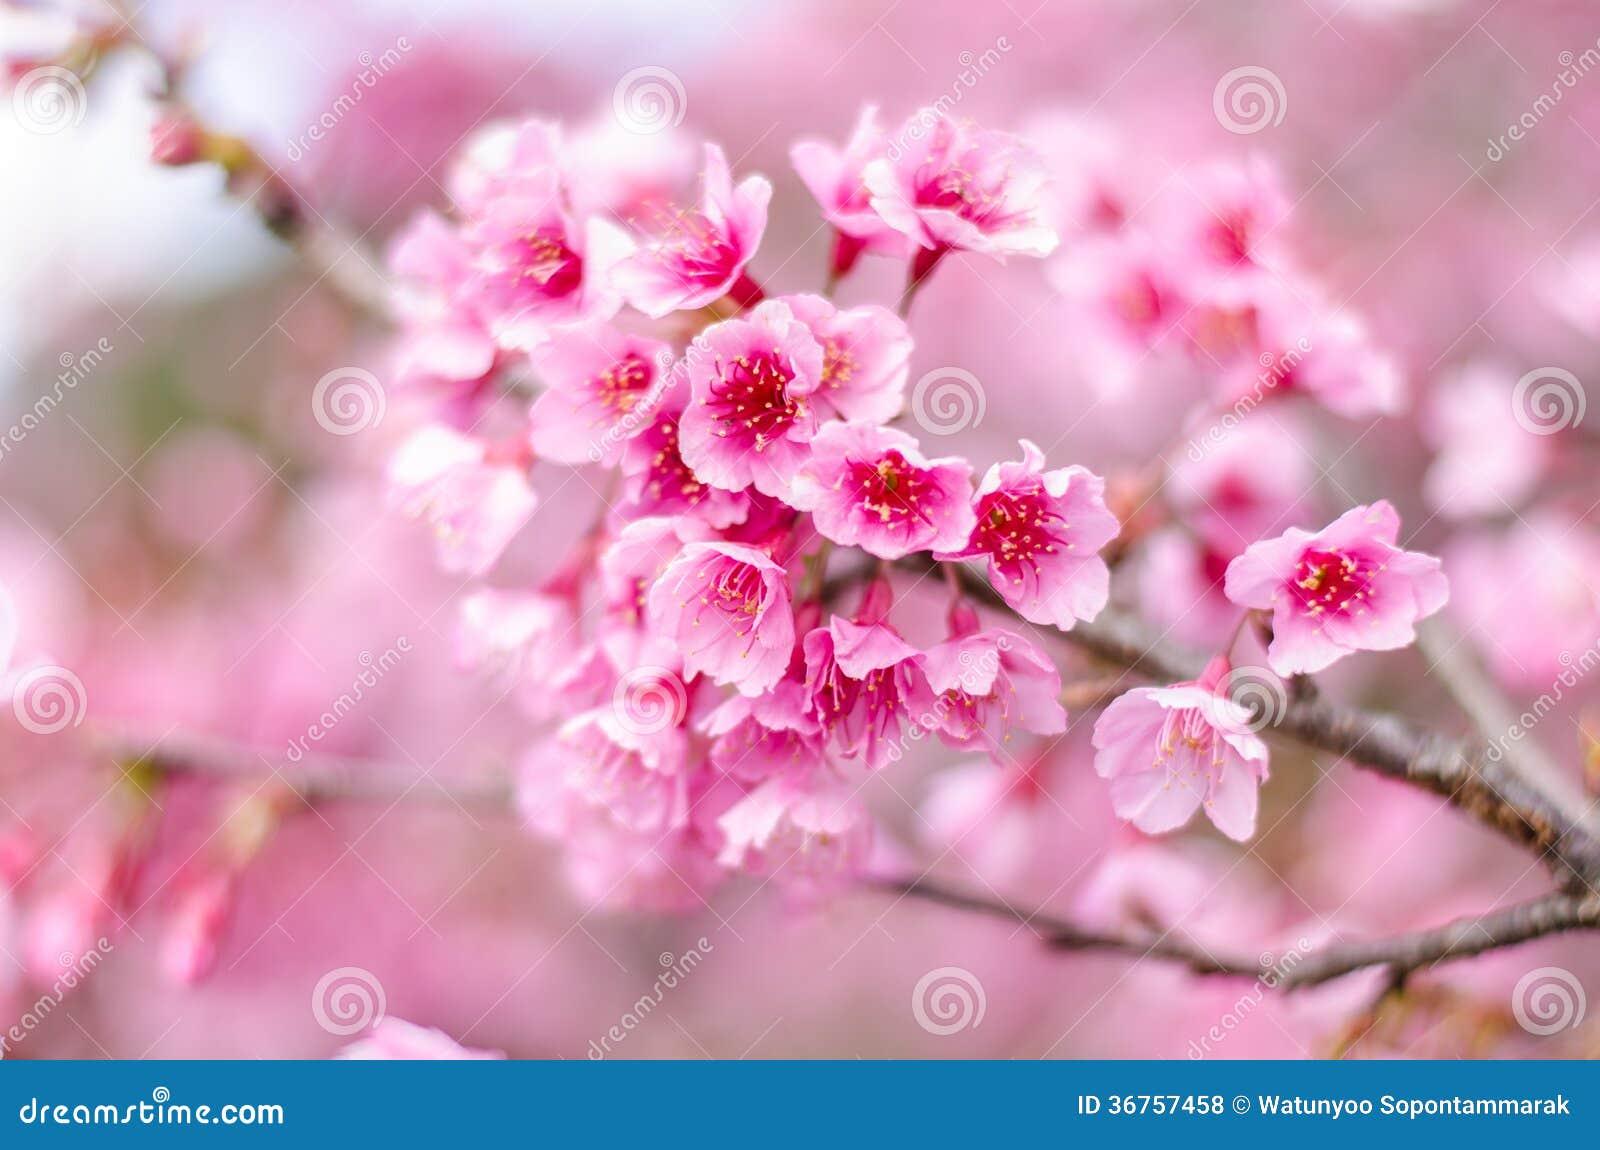 Sakura flower stock photo image of cherry landscape 47604454 beautiful cherry blossom pink sakura flower royalty free stock photos mightylinksfo